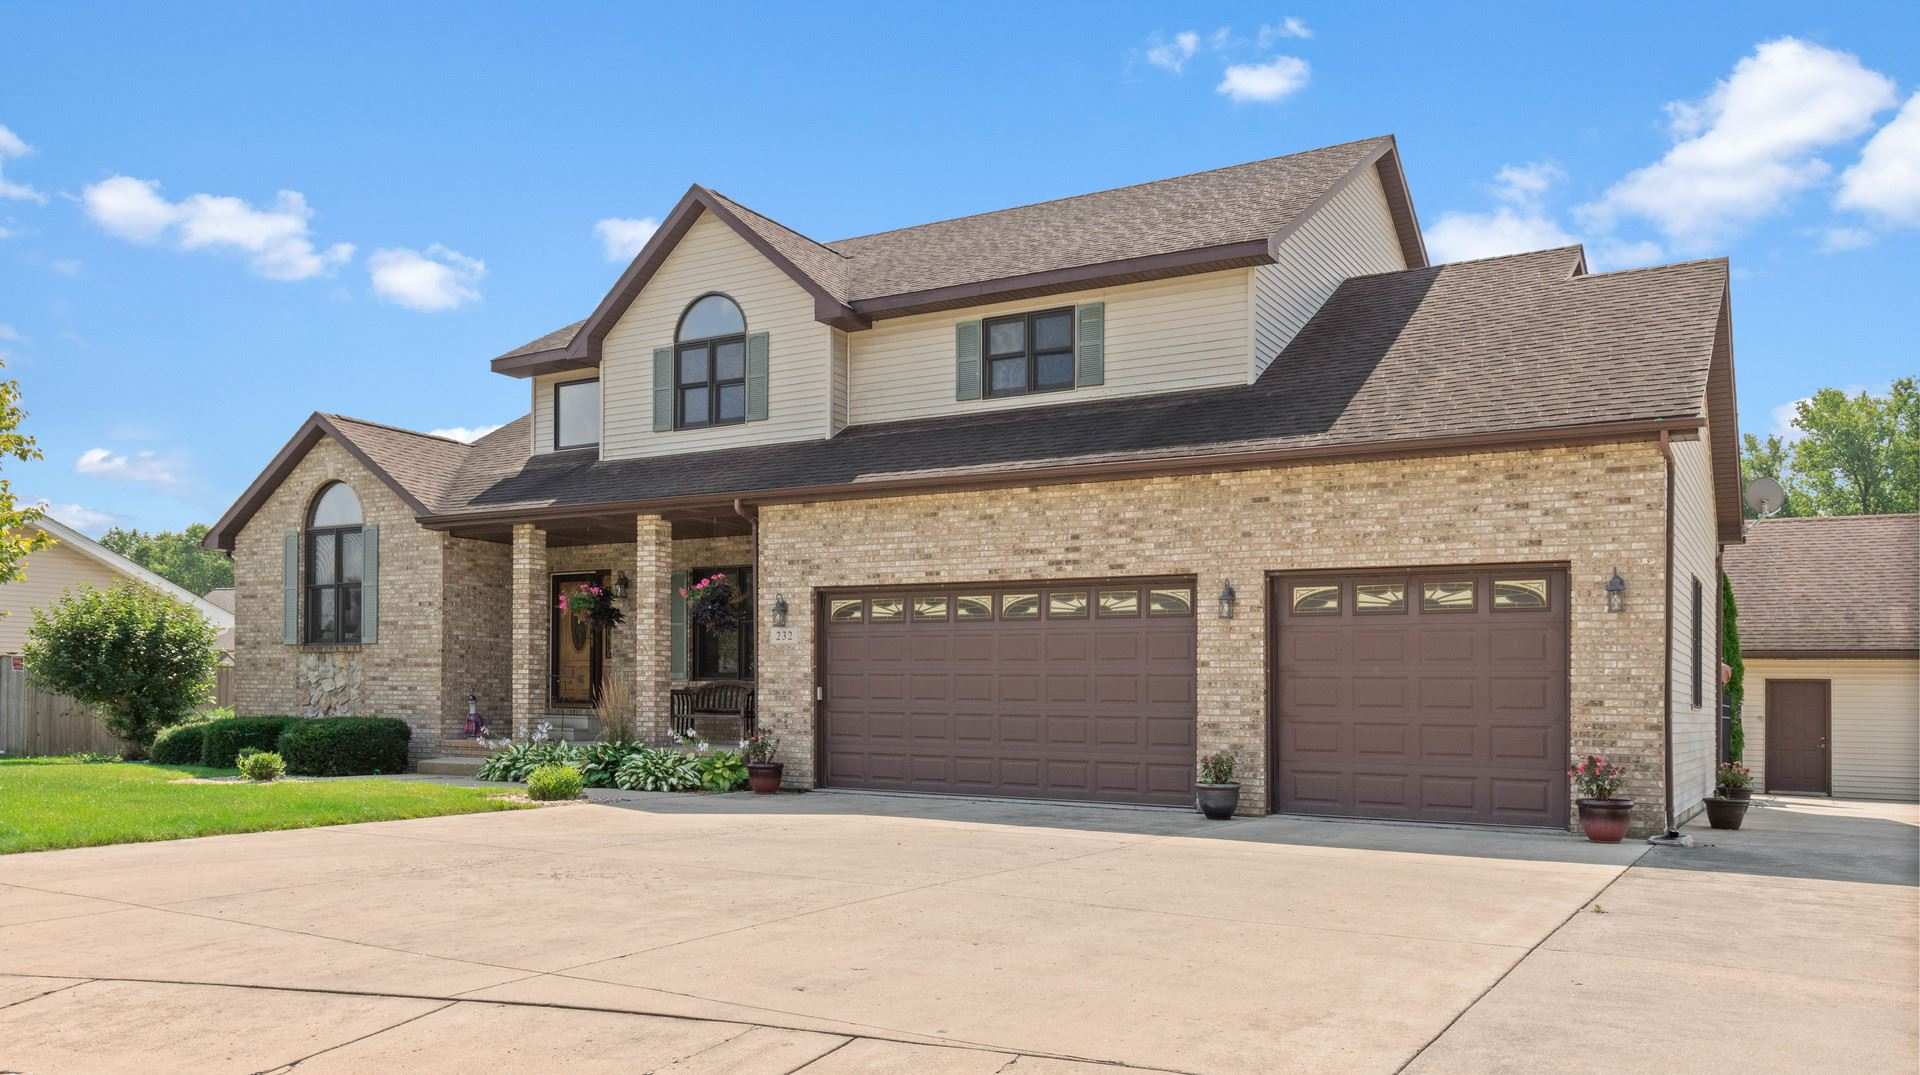 232 Teal Lane, Braidwood, IL 60408 - MLS#: 11193514